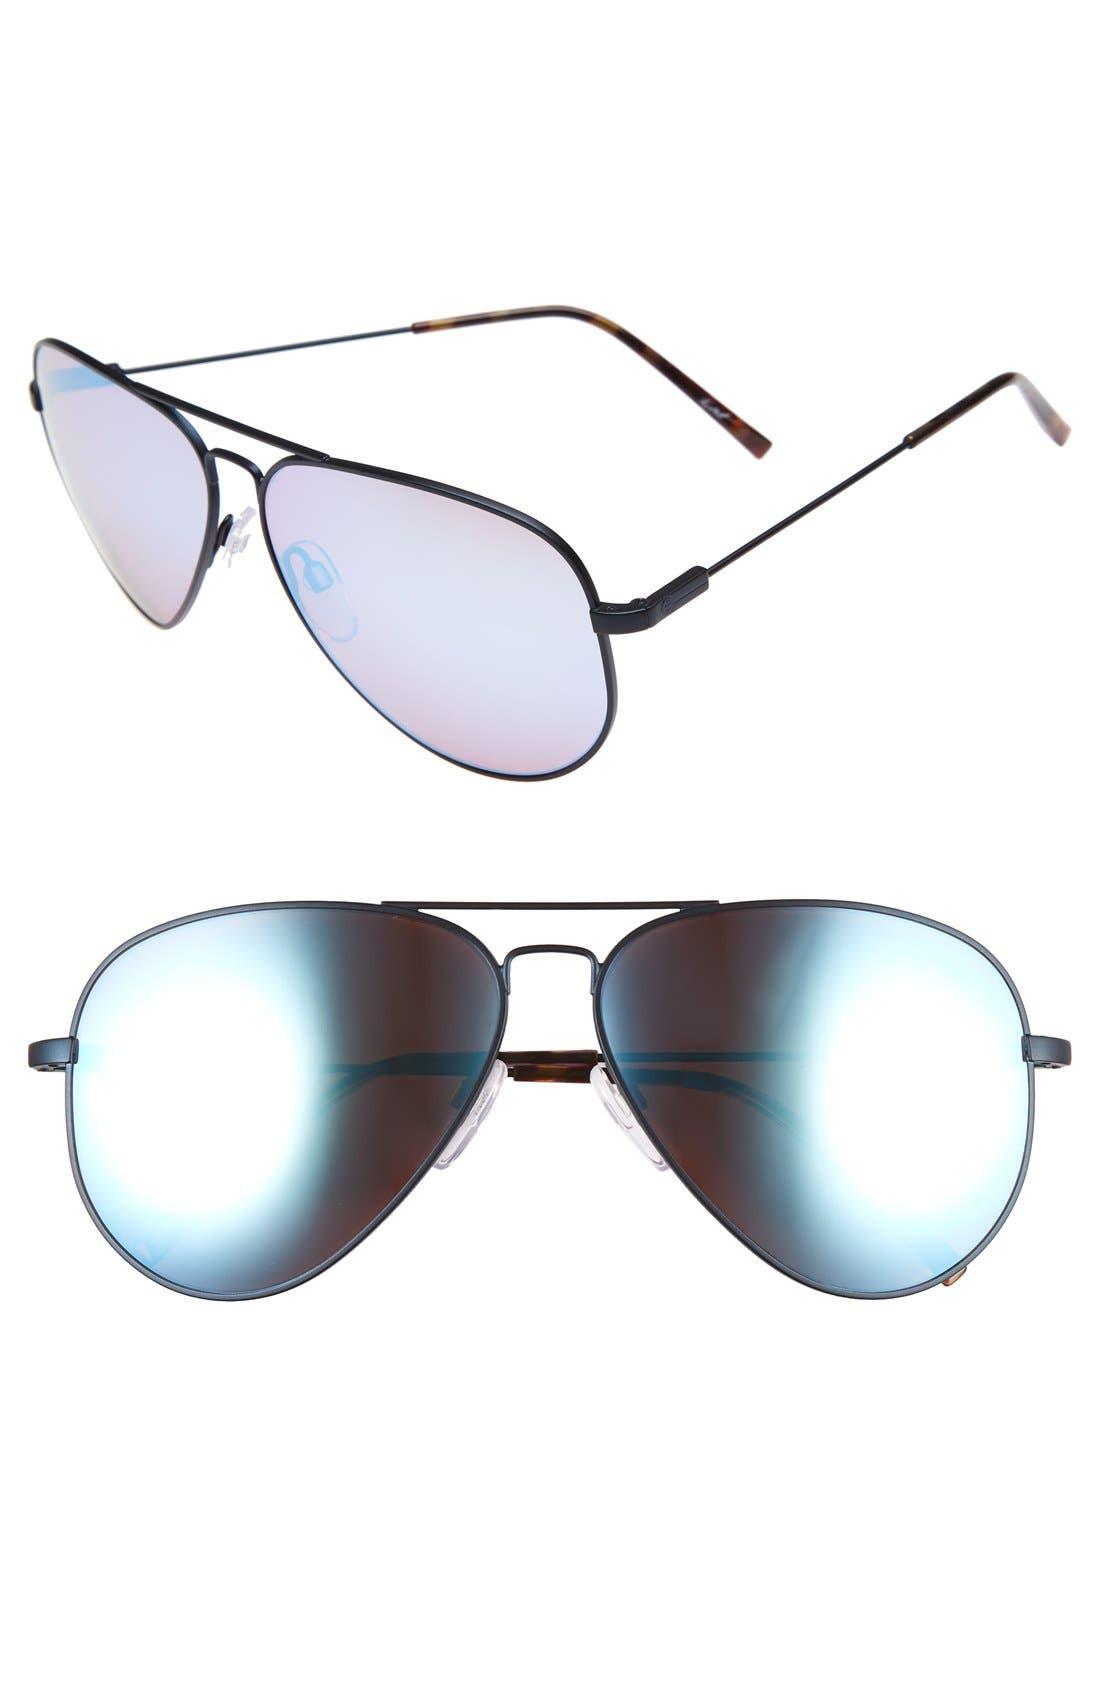 ELECTRIC AV1 XL 62mm Aviator Sunglasses